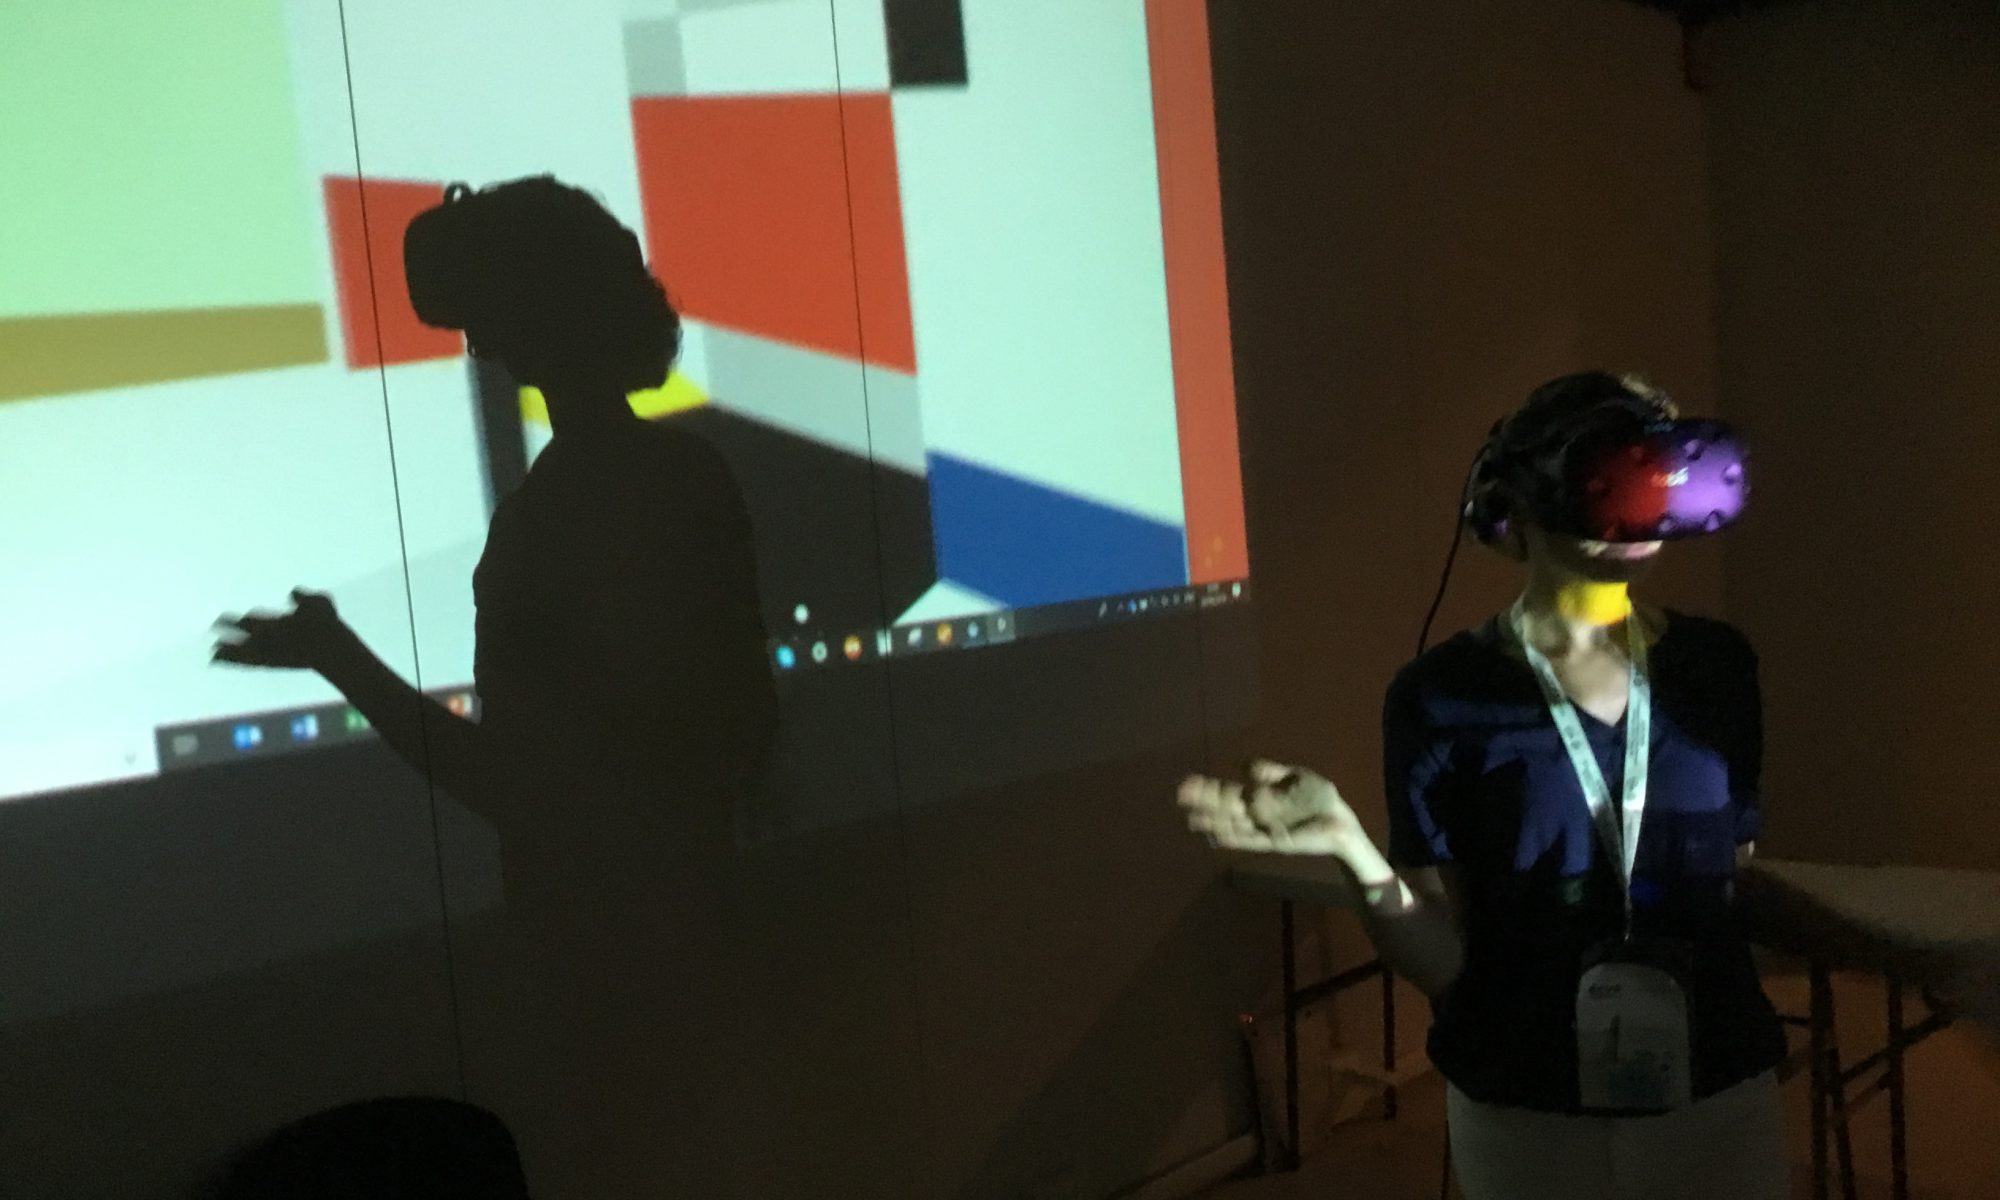 Mondrian in Perceptual, Real, and Virtual Space